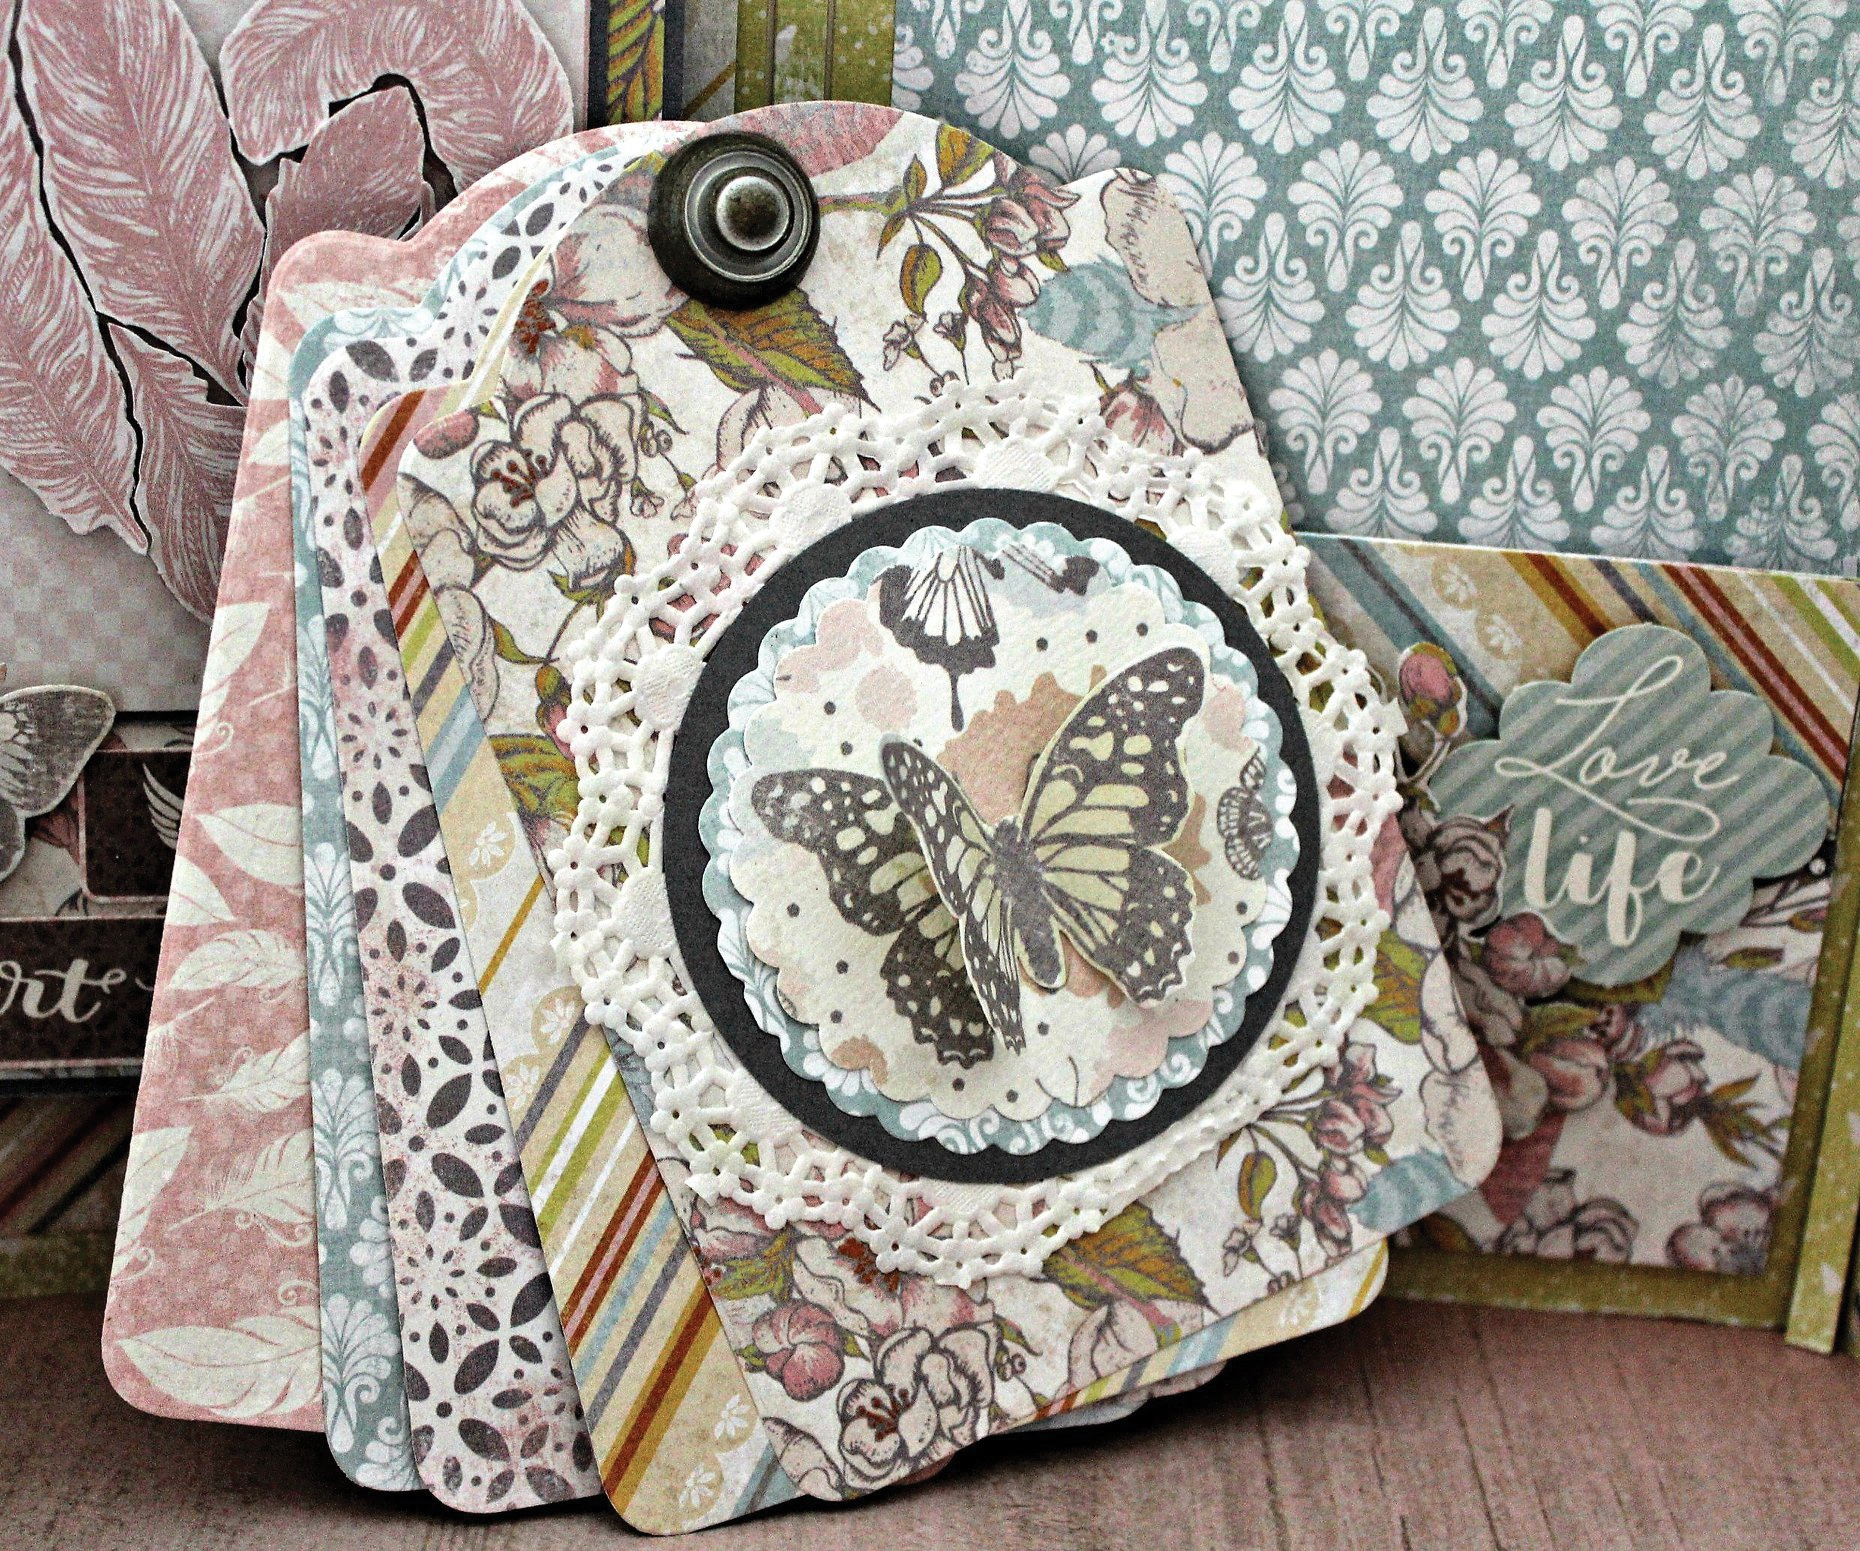 Authentique Double-Sided Cardstock Pad 12X12 18/Pkg-Dreamy, 6 Designs/3 Each